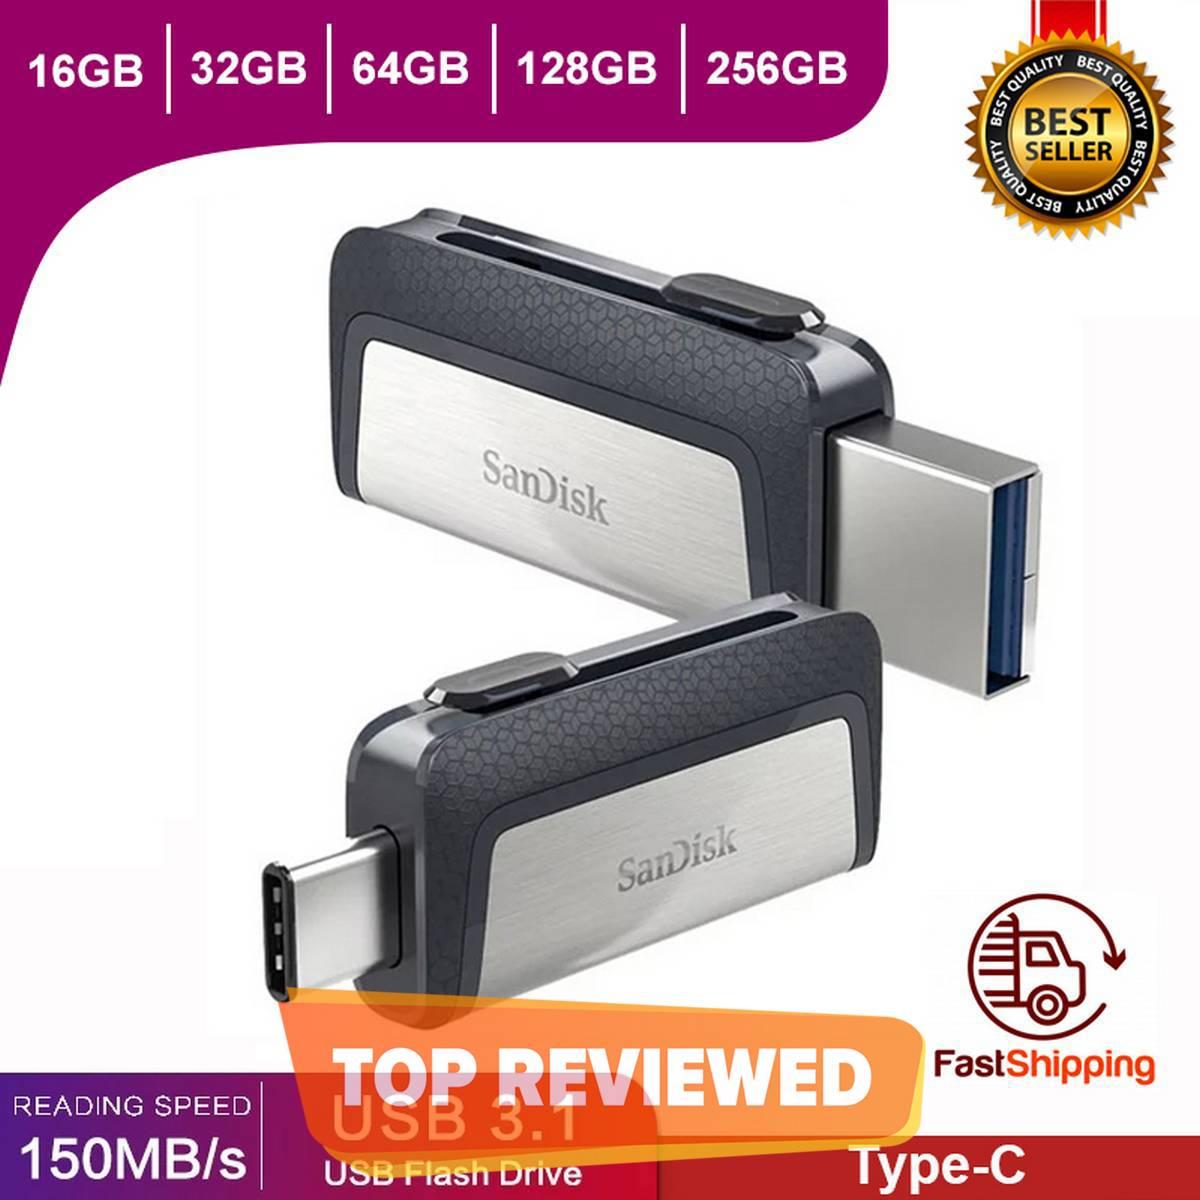 SanDisk OTG Flash Drive 16GB/32GB/64GB/128GB/256GB Ultra Dual USB3.1 Disk OTG Type-C Pen Drive Stick for Smartphone Laptop